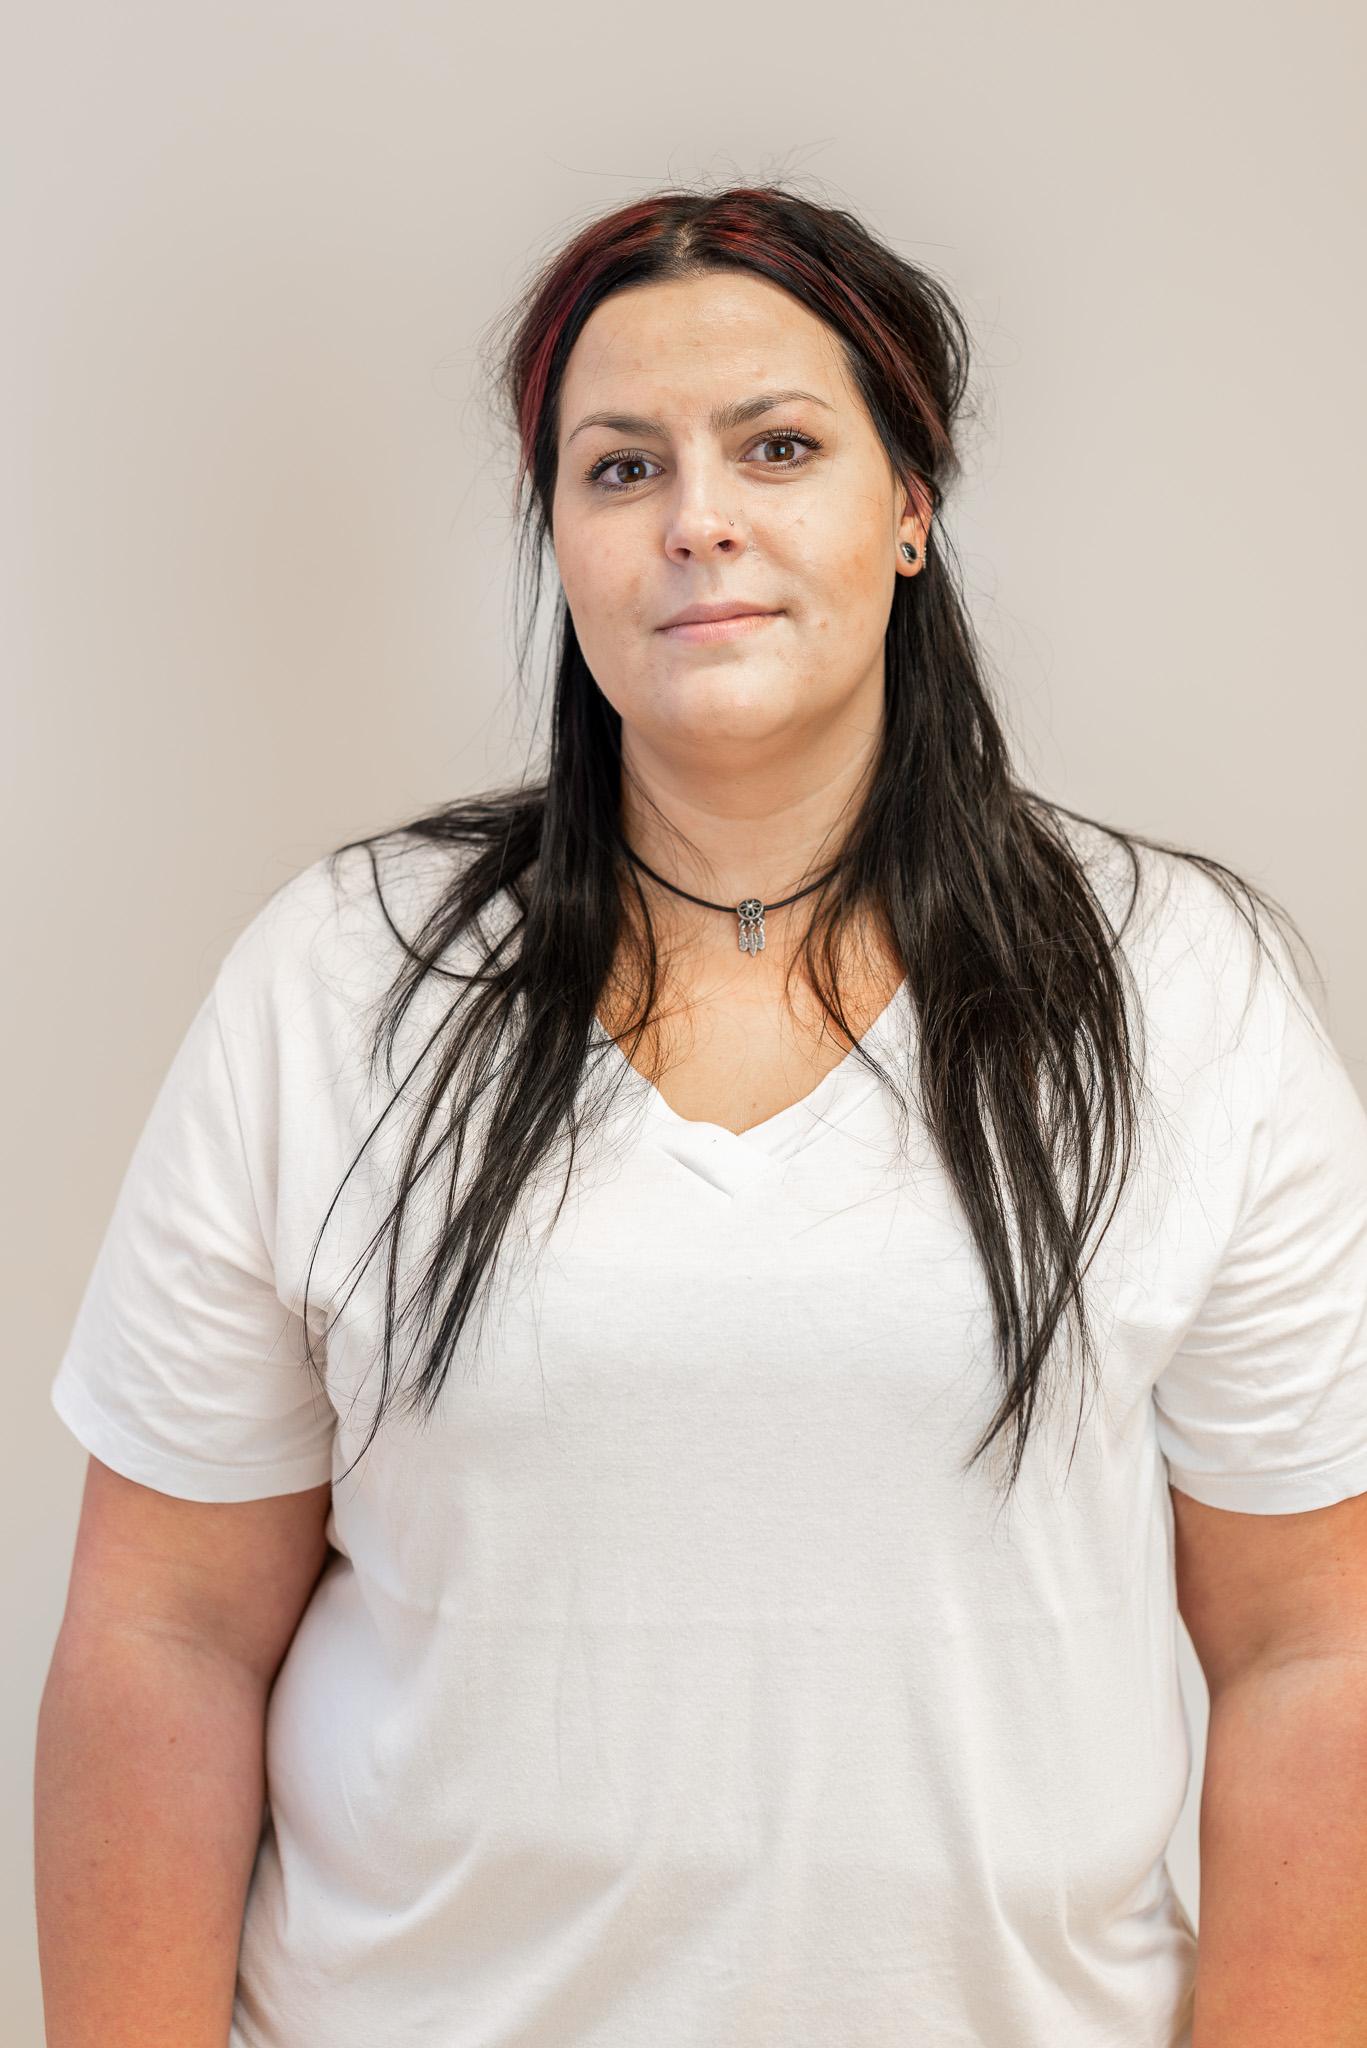 PhDr. Nina Sládeková, PhD.